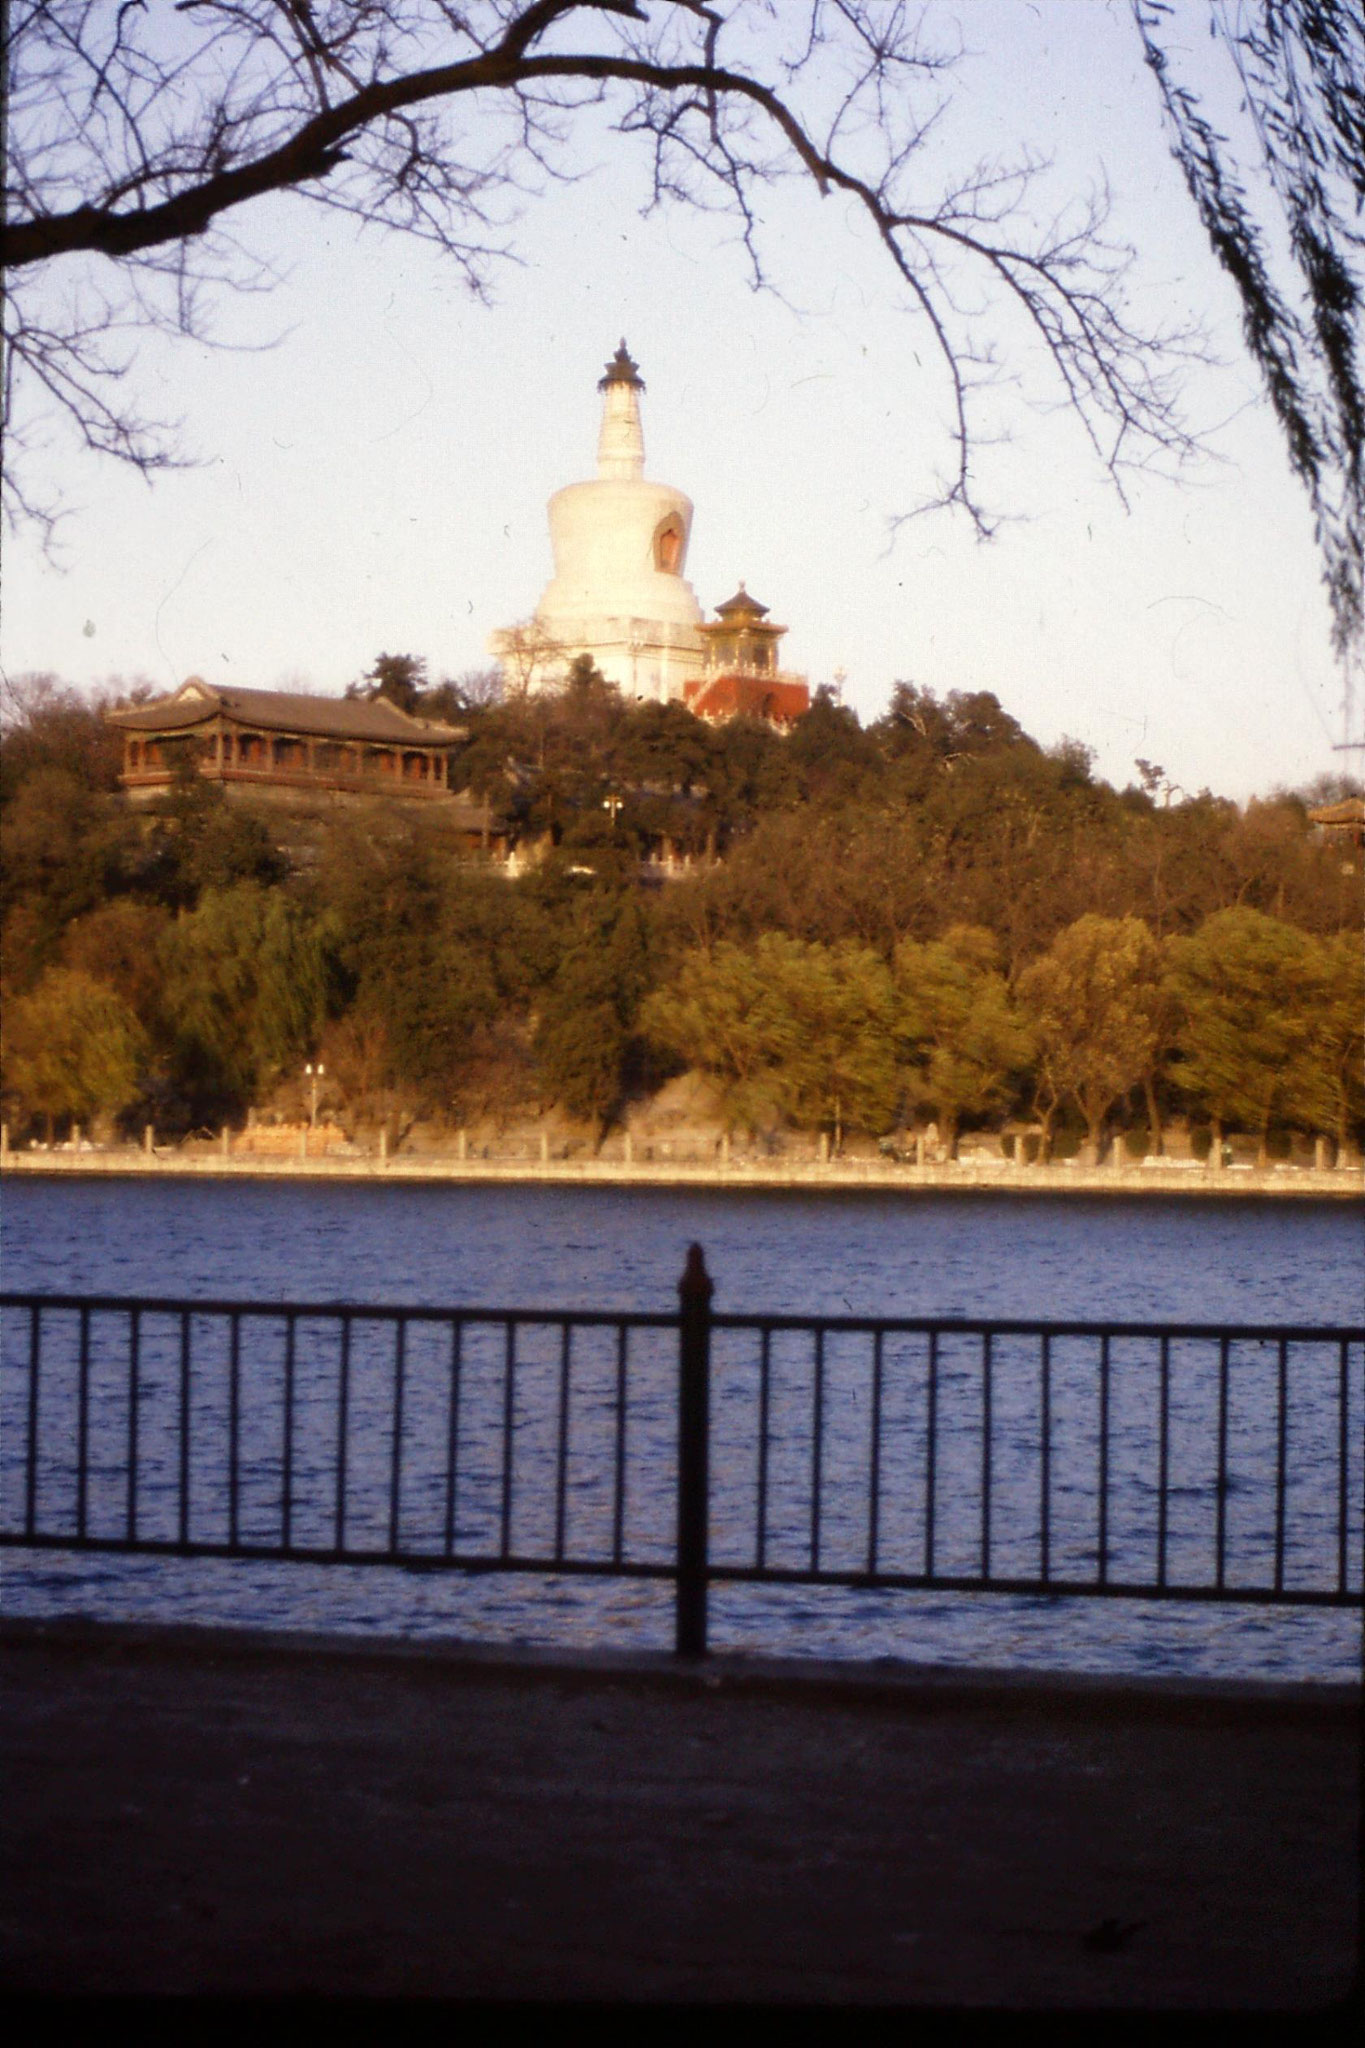 26/11/1988: 8:Beihai Park